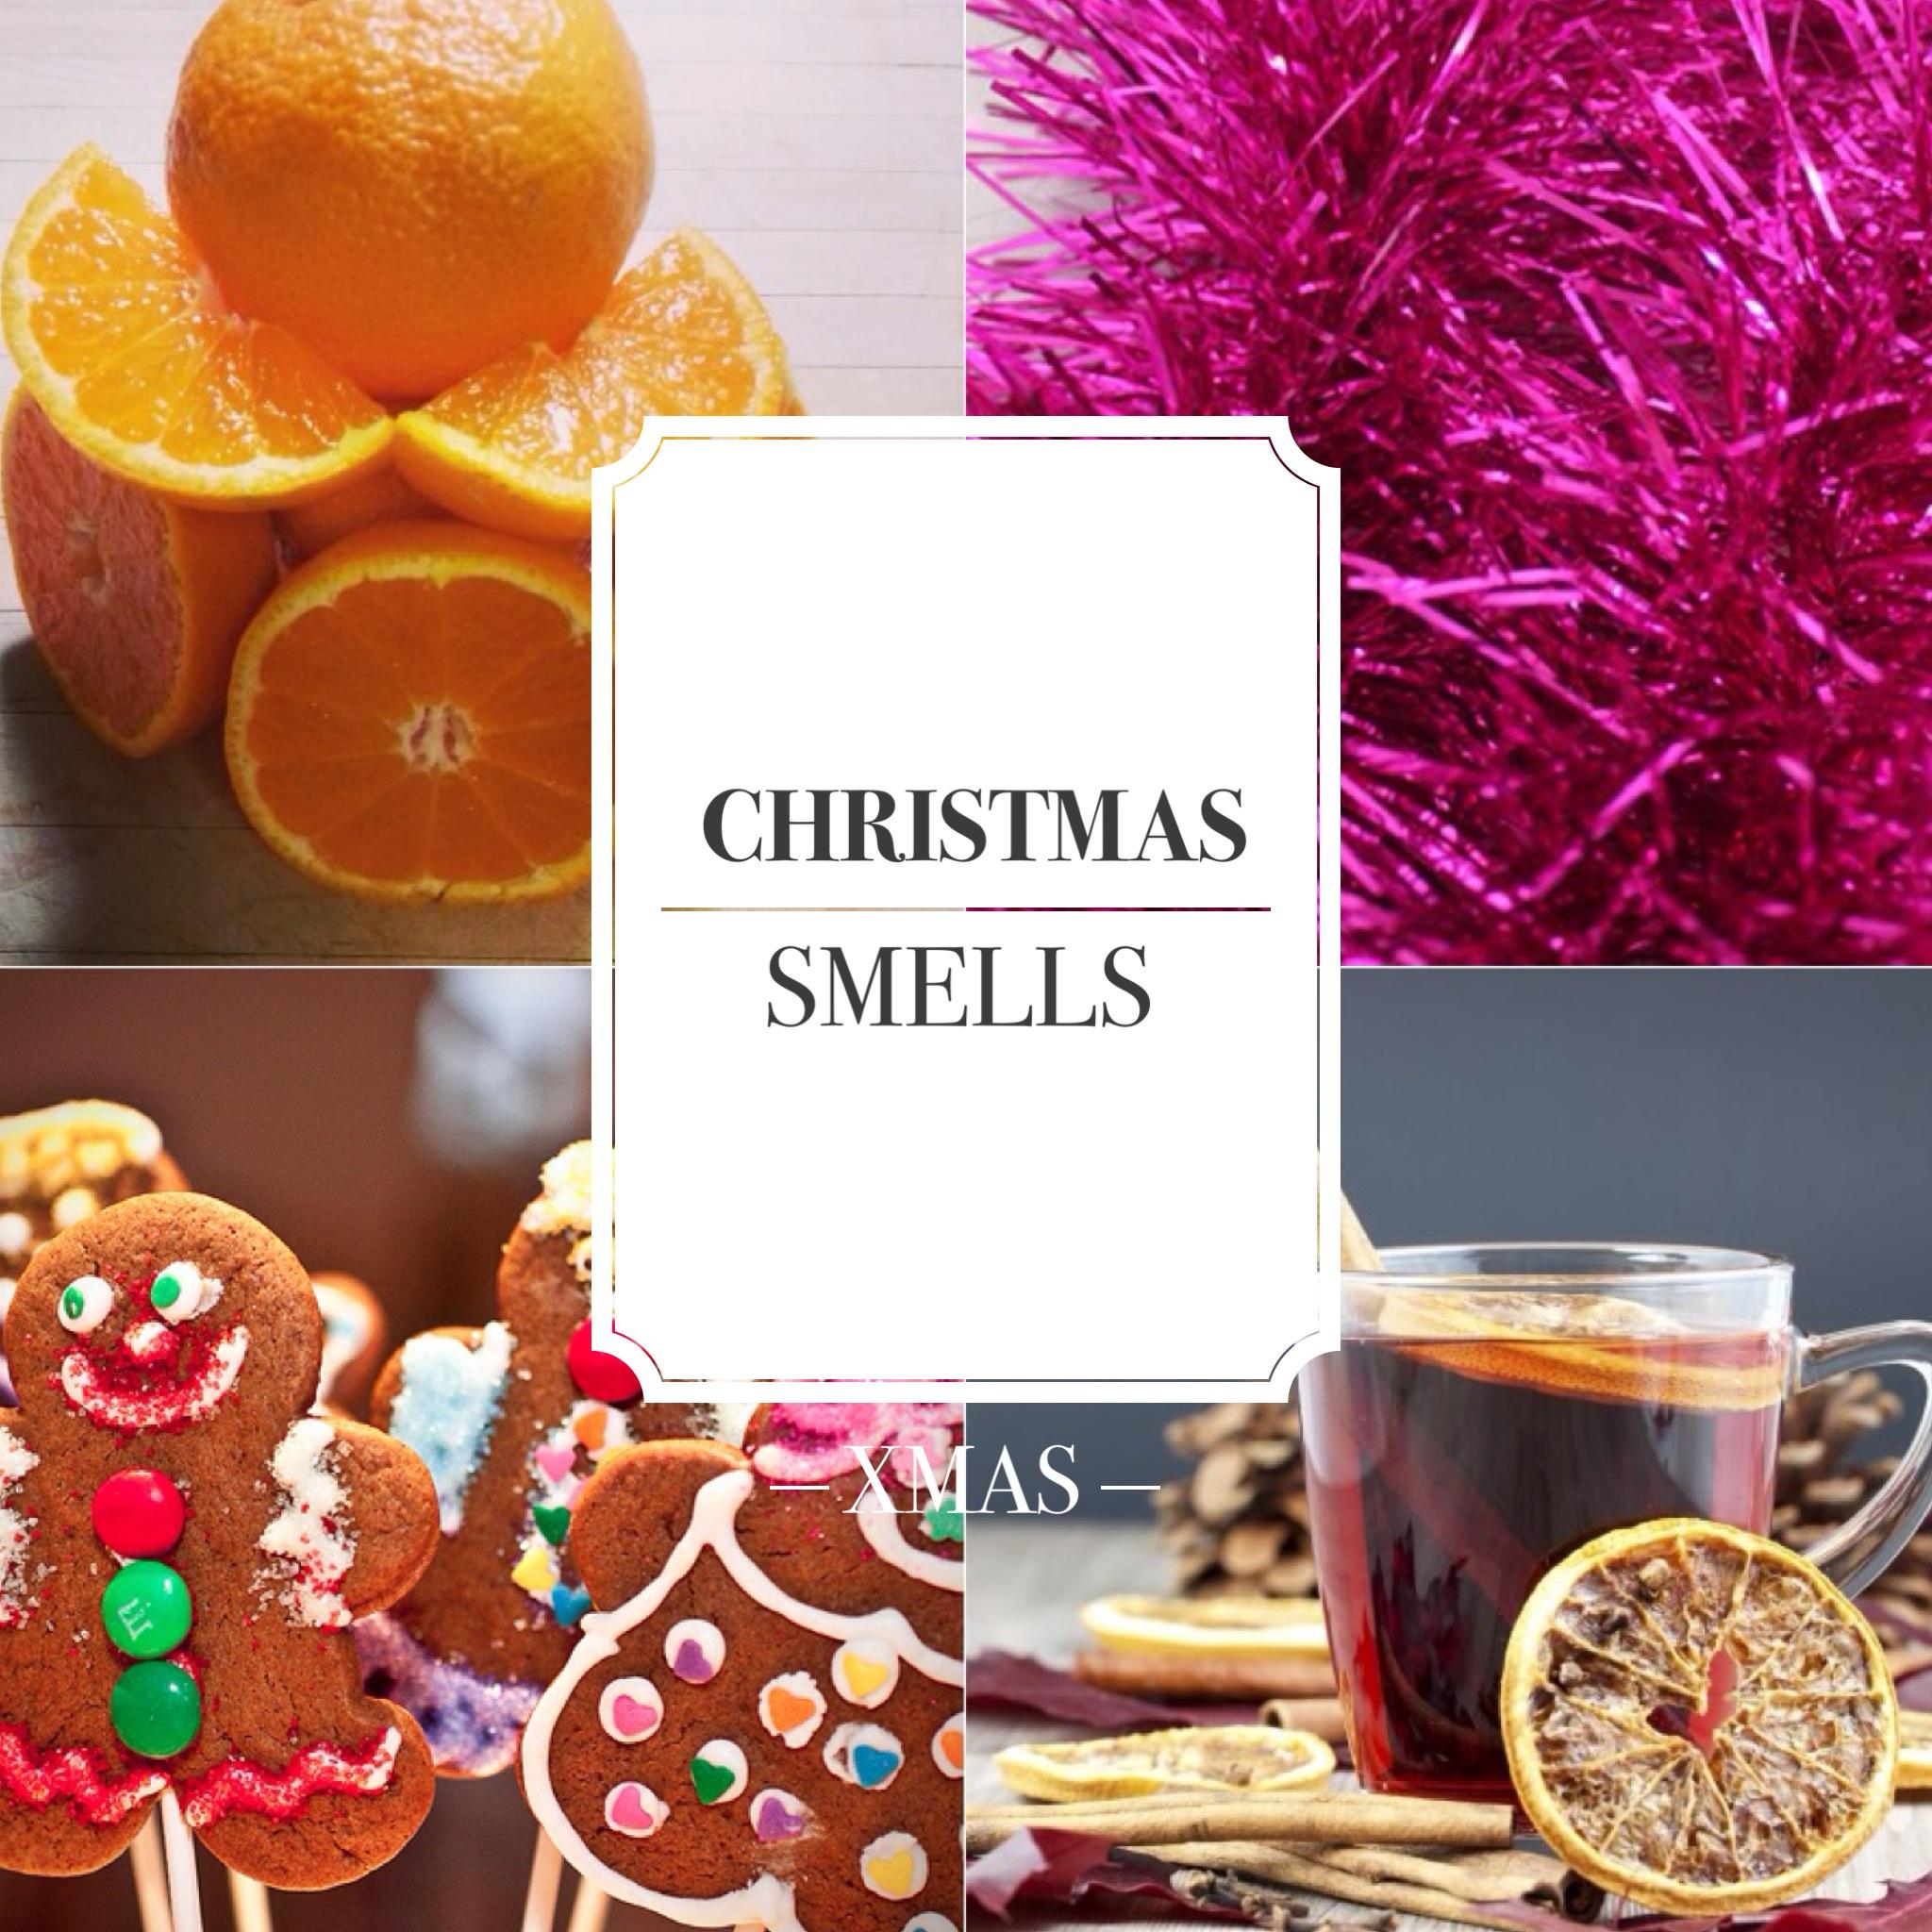 Christmas Smells (Really Good) – The Candy Perfume Boy